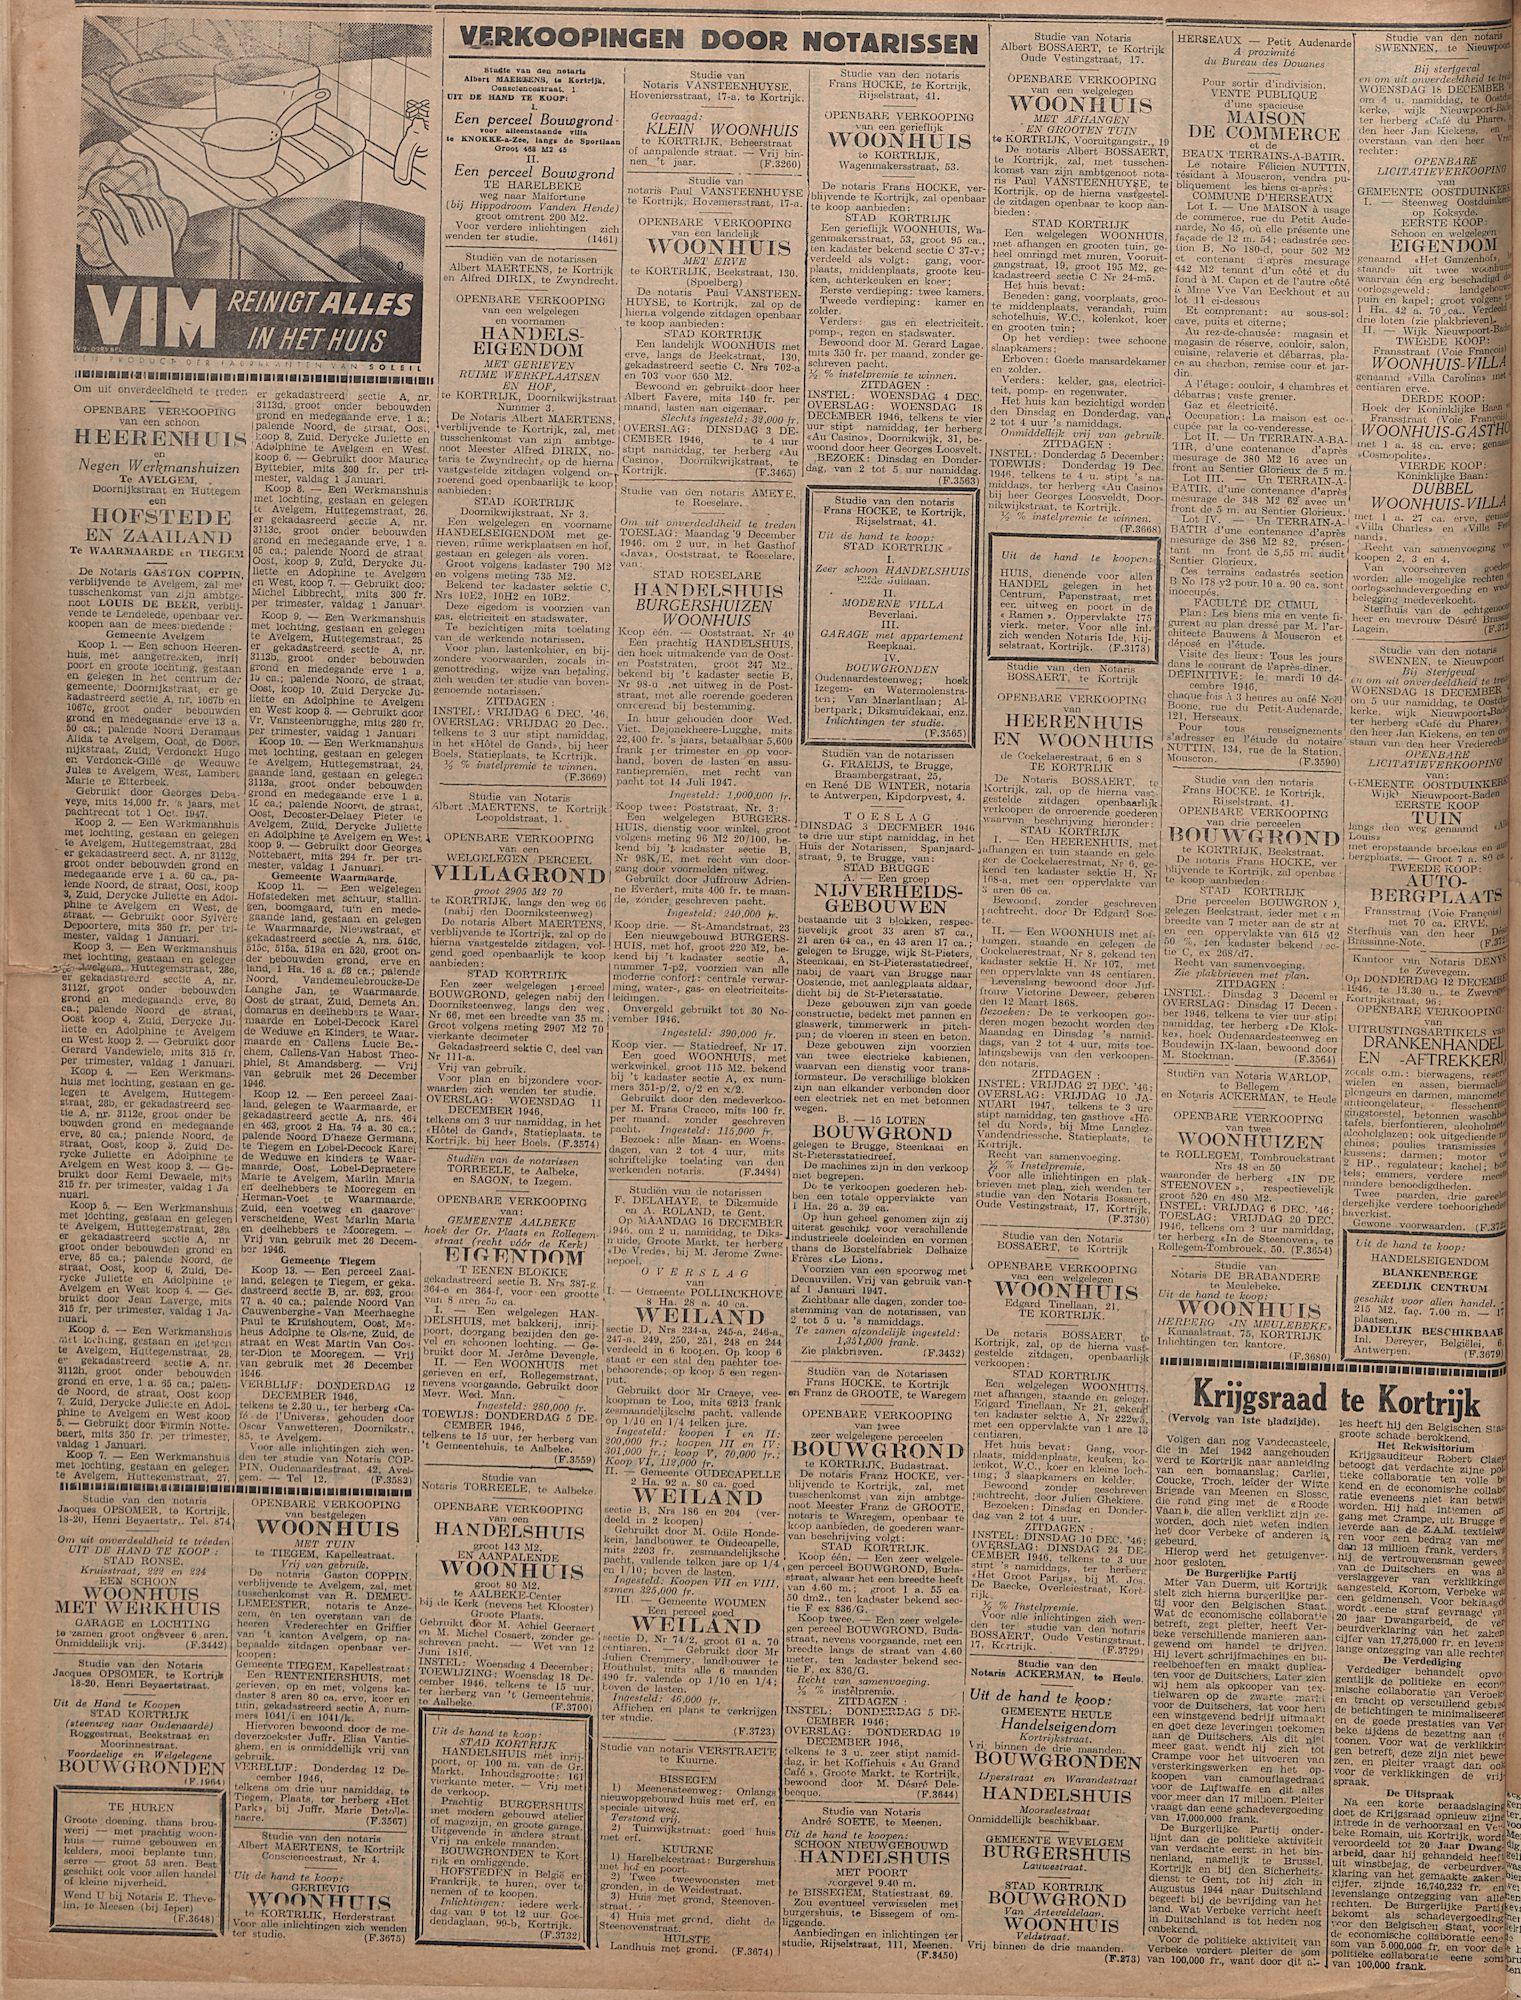 Kortirjksch Handelsblad 29 november 1946 Nr96 p4